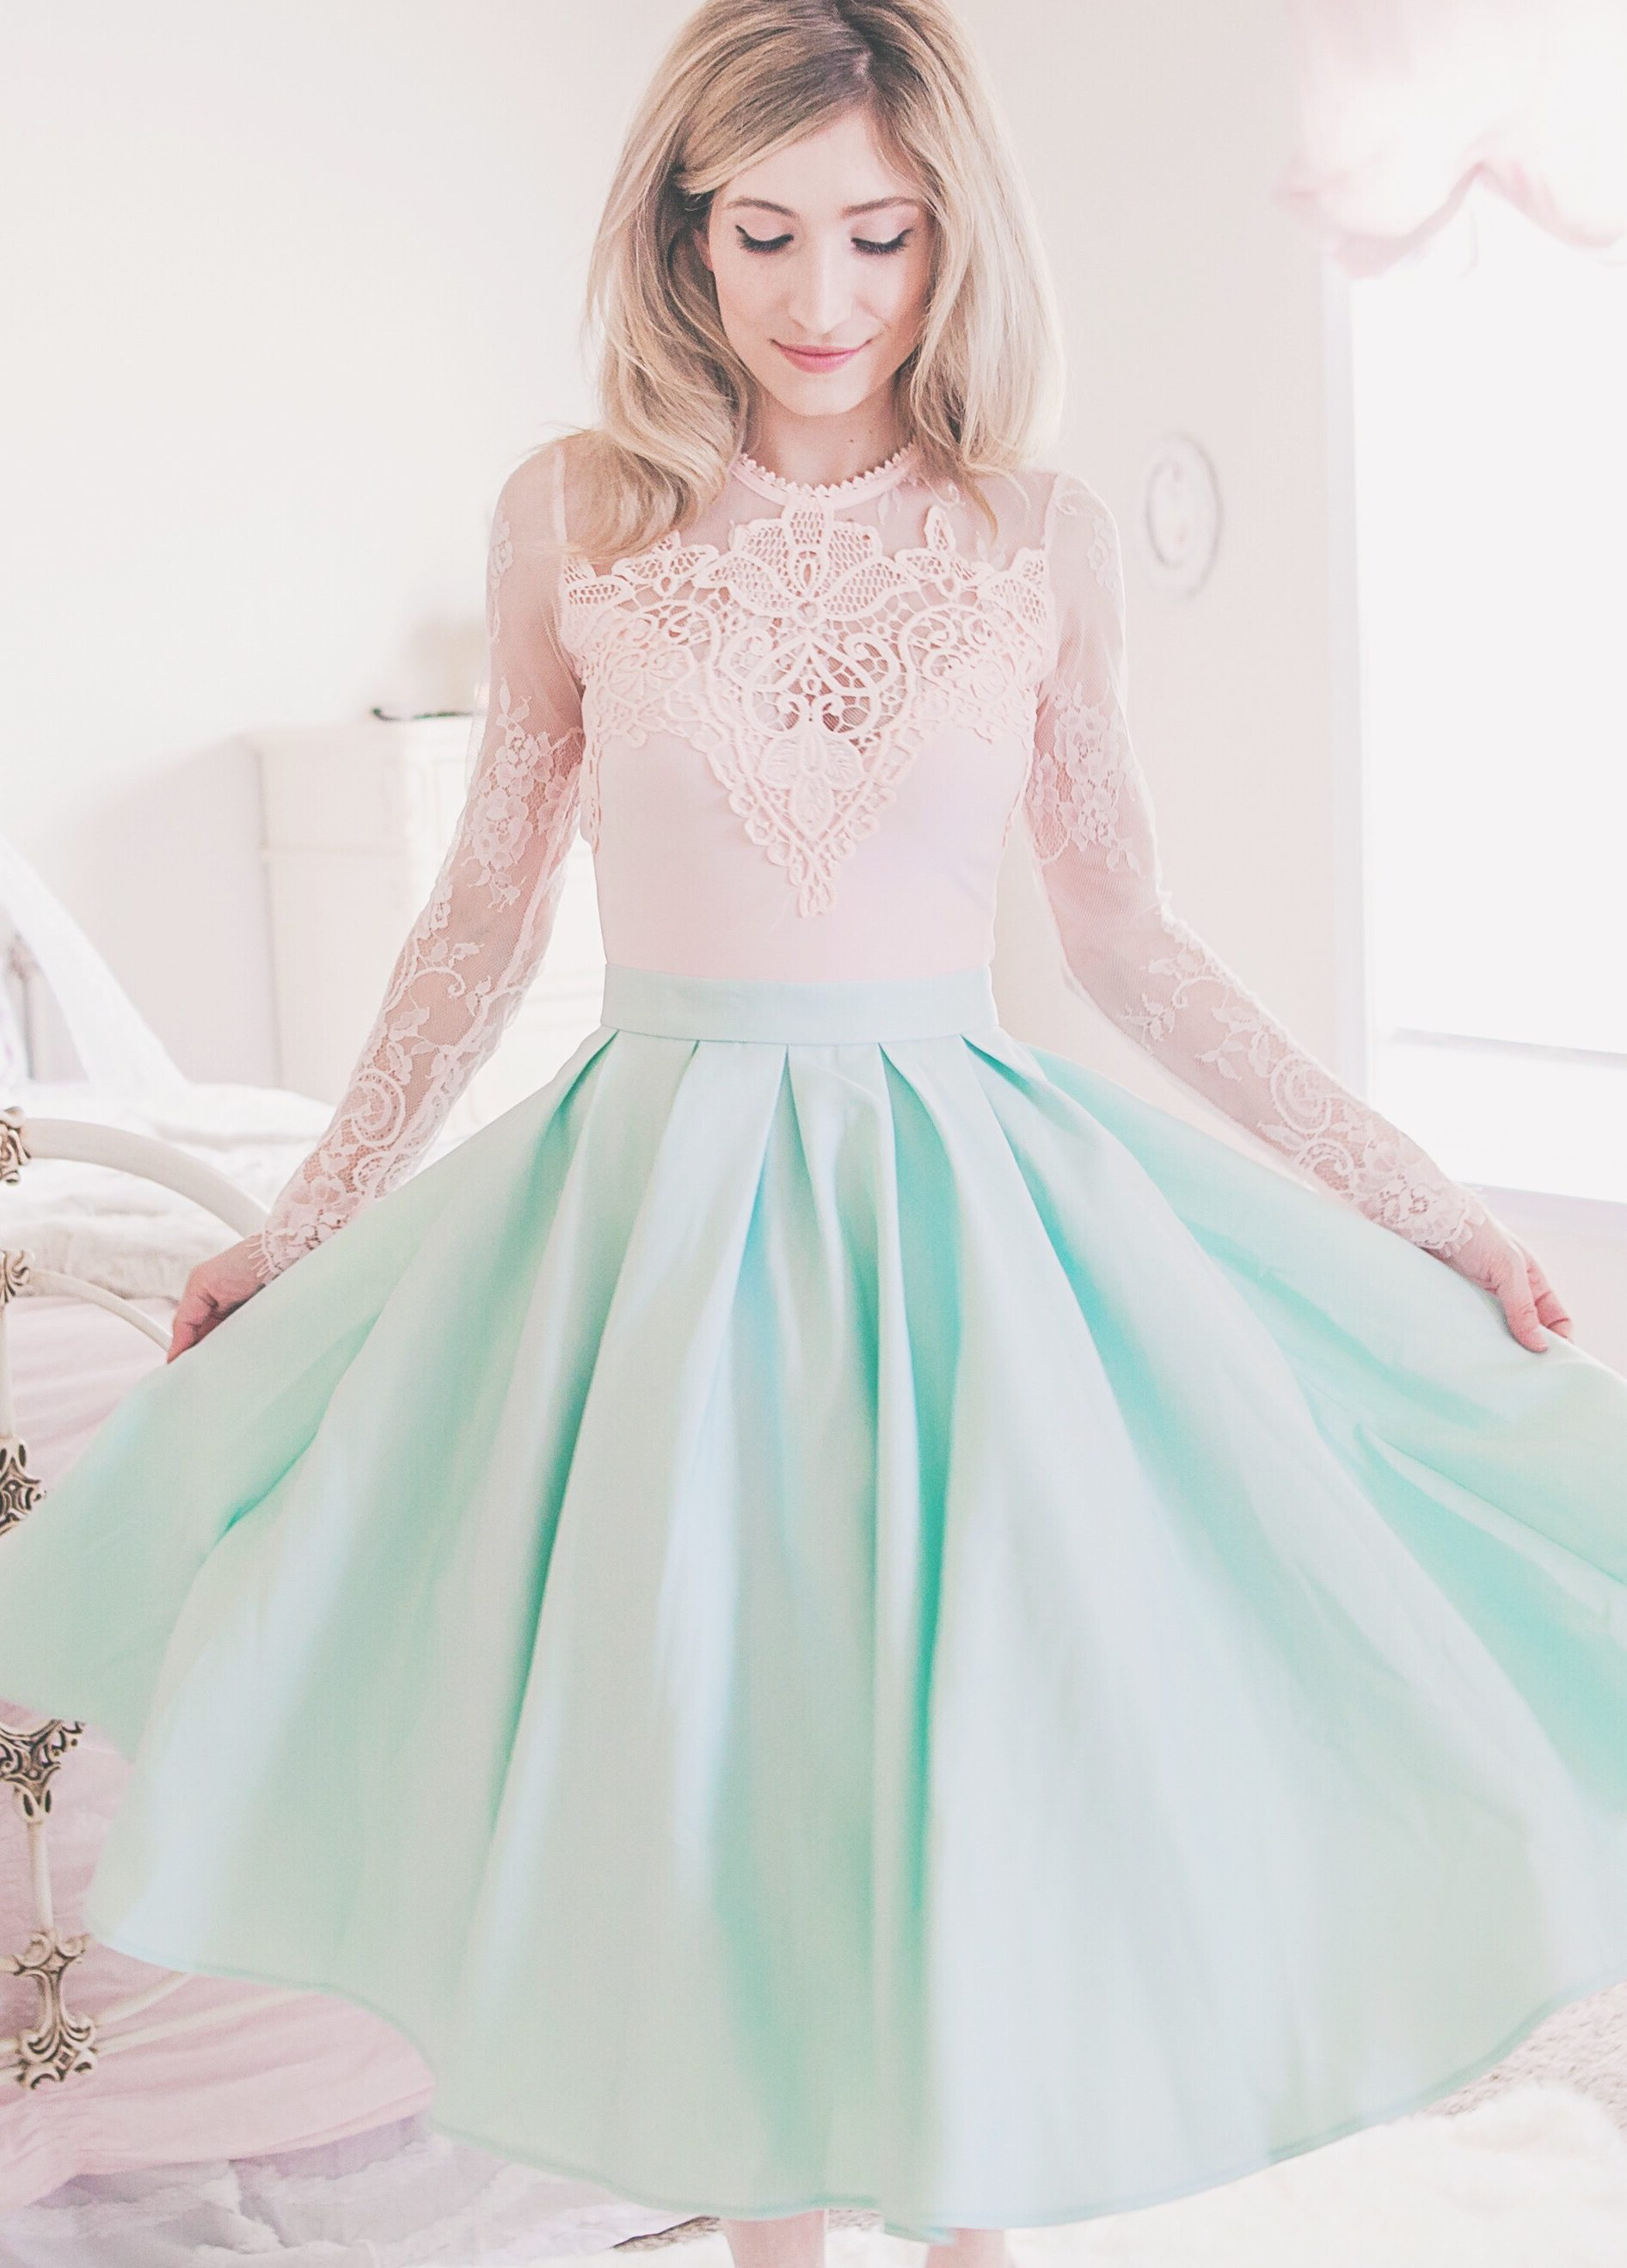 Forever 21 Shopping Haul + My Spring Capsule Wardrobe - Jadore Lexie ...